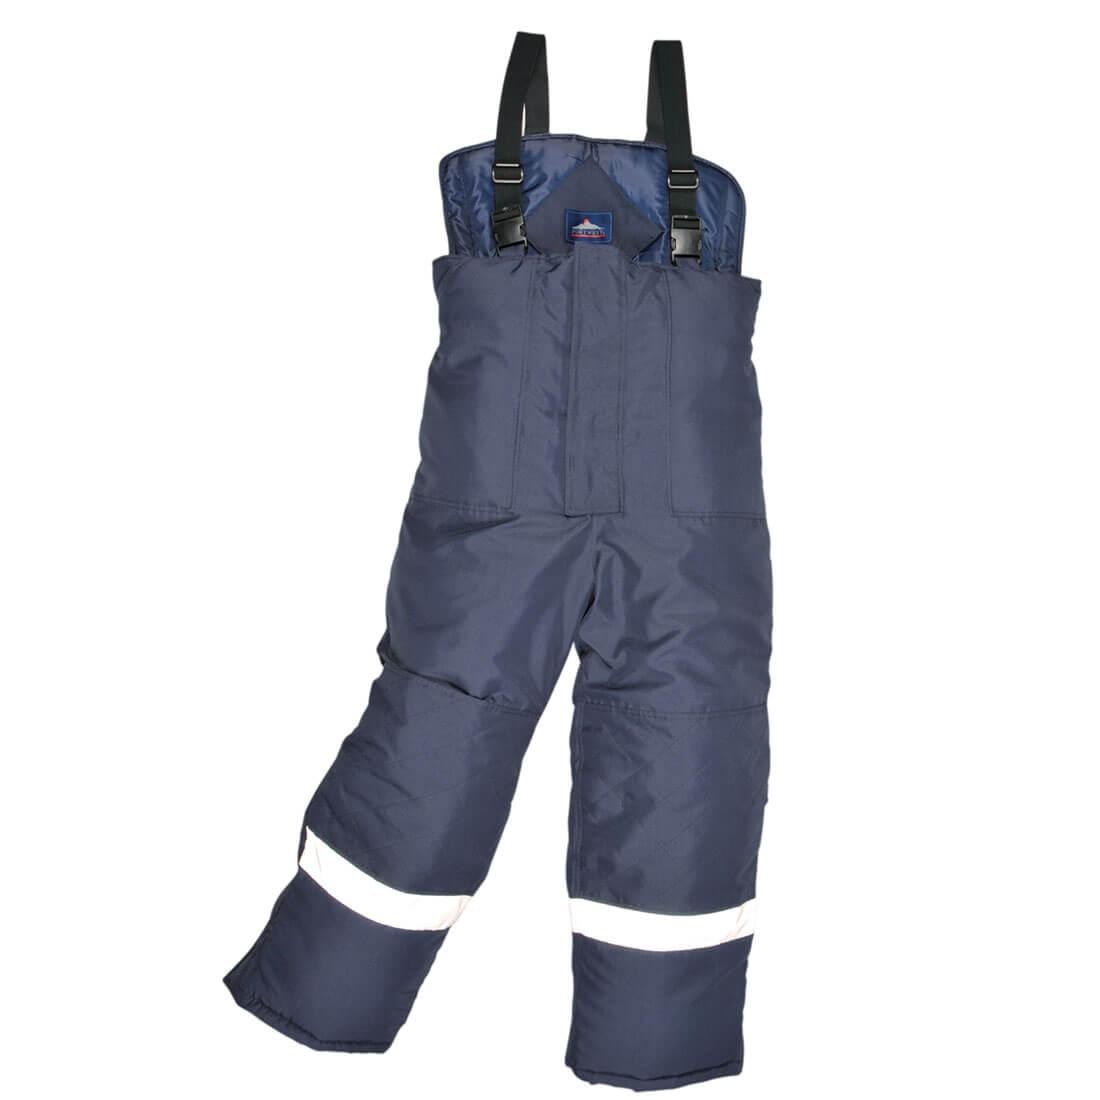 Pantaloni ColdStore - Imbracaminte de protectie